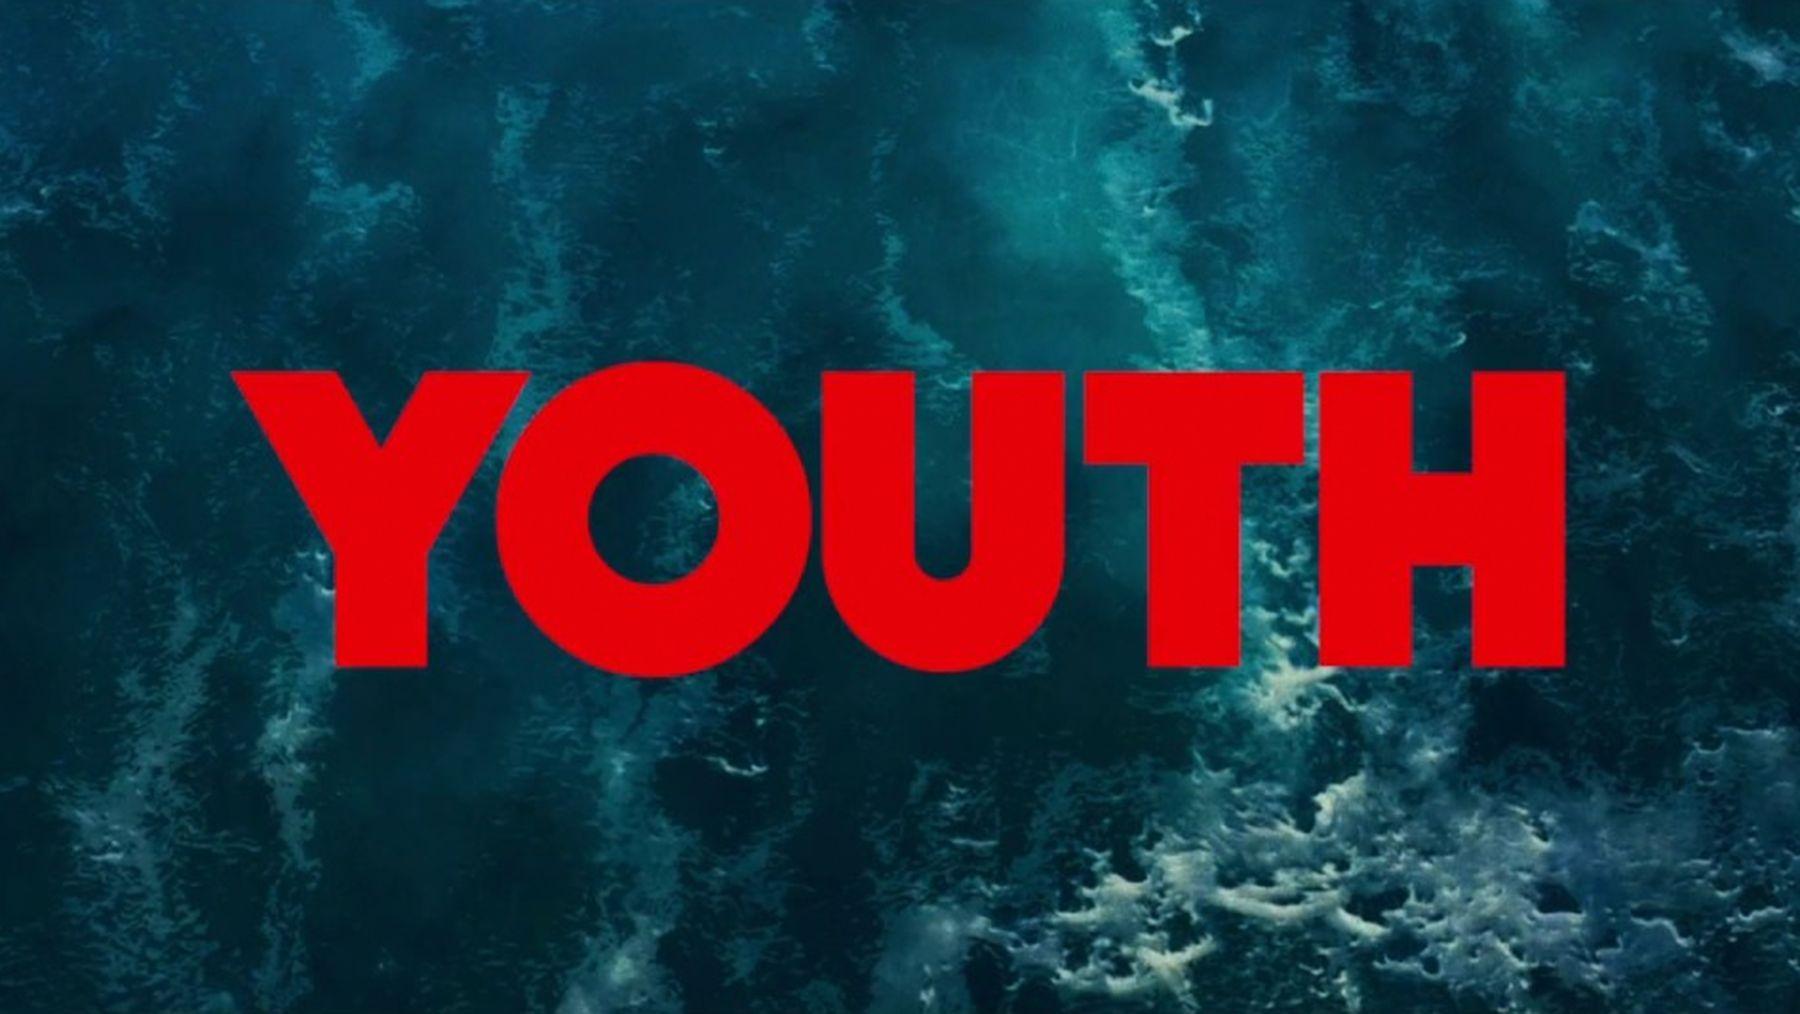 Ásgeir - Youth | Musik | Was is hier eigentlich los?